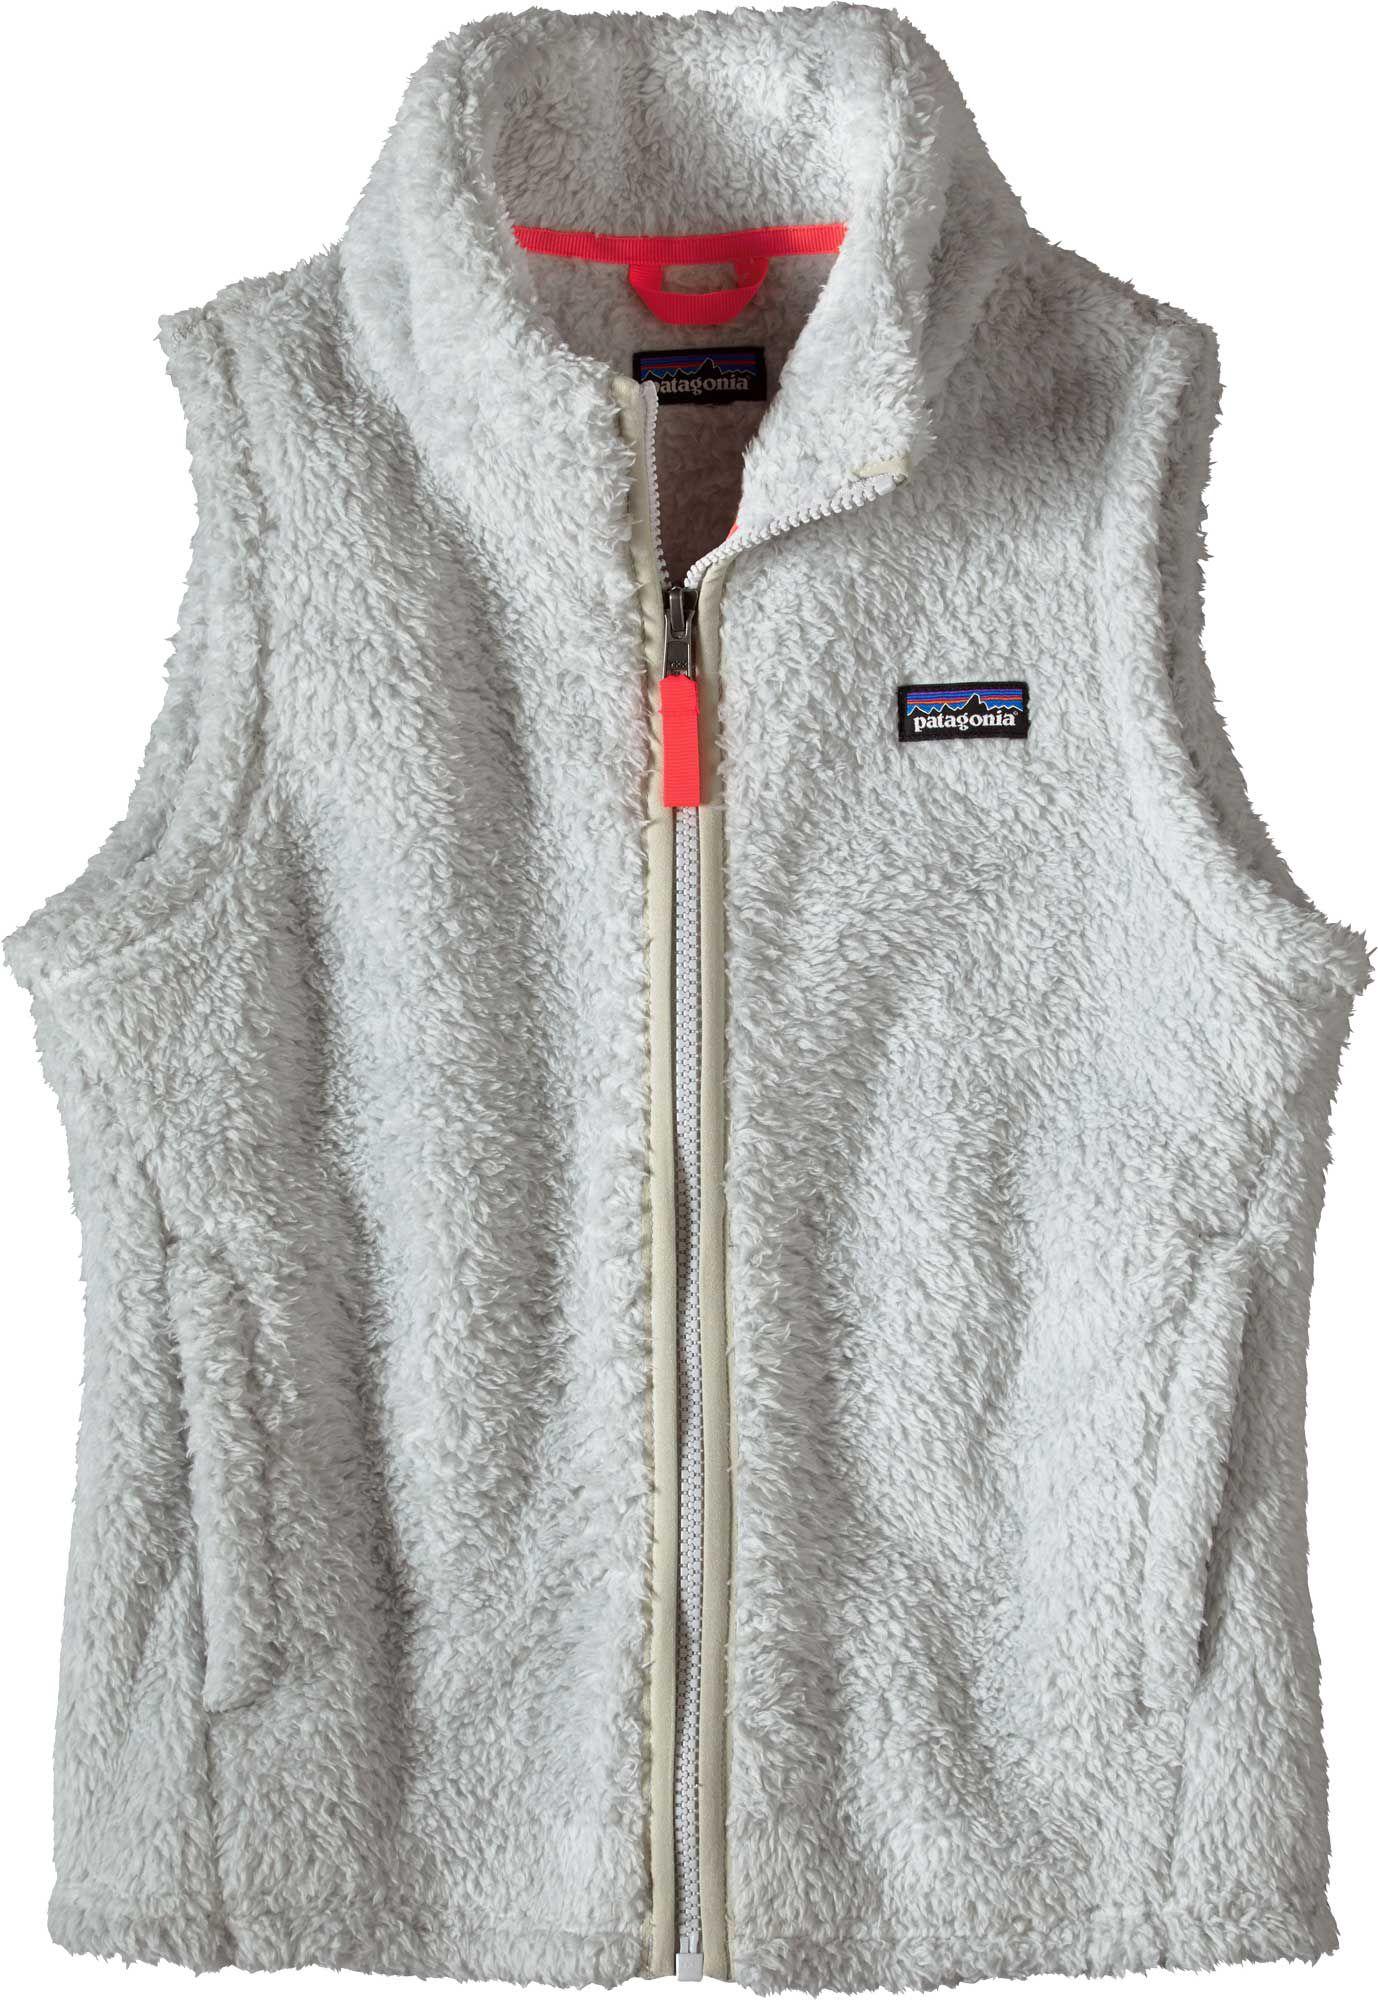 2d3a8bb35388e Patagonia Girls  Los Gatos Fleece Vest